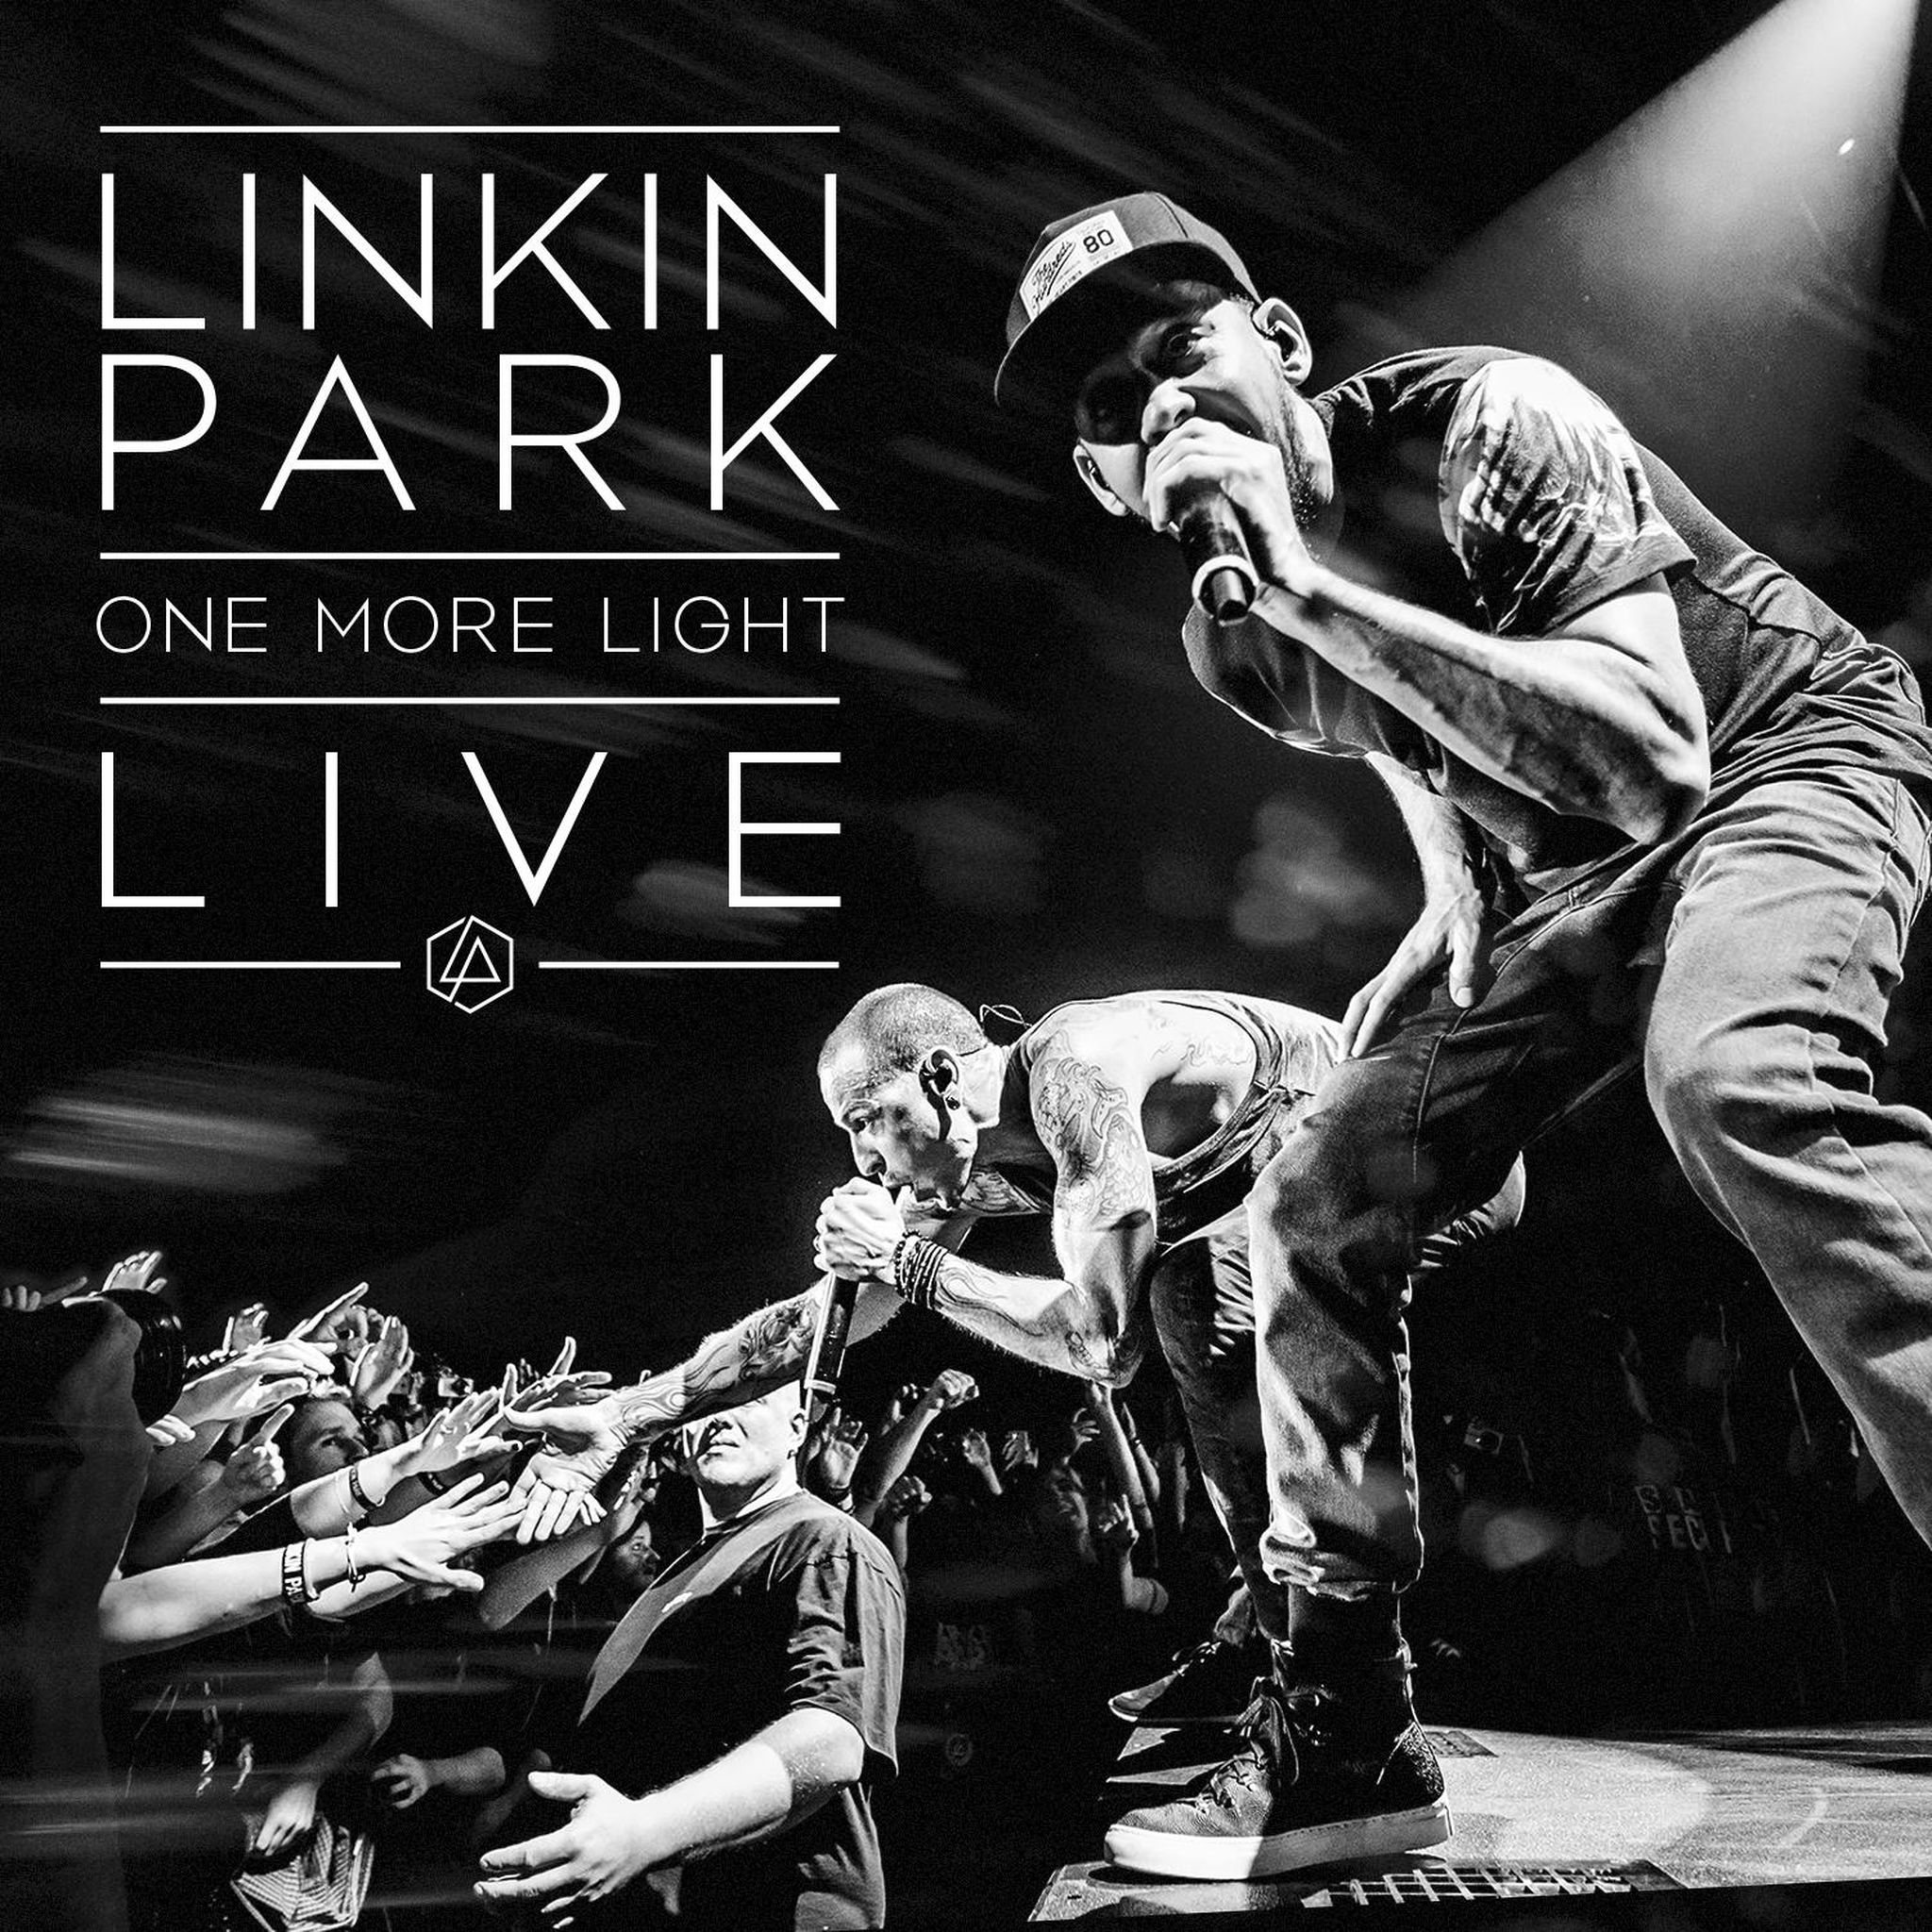 Linkin Park Linkin Park — One More Light Live (2 LP) one more light cd